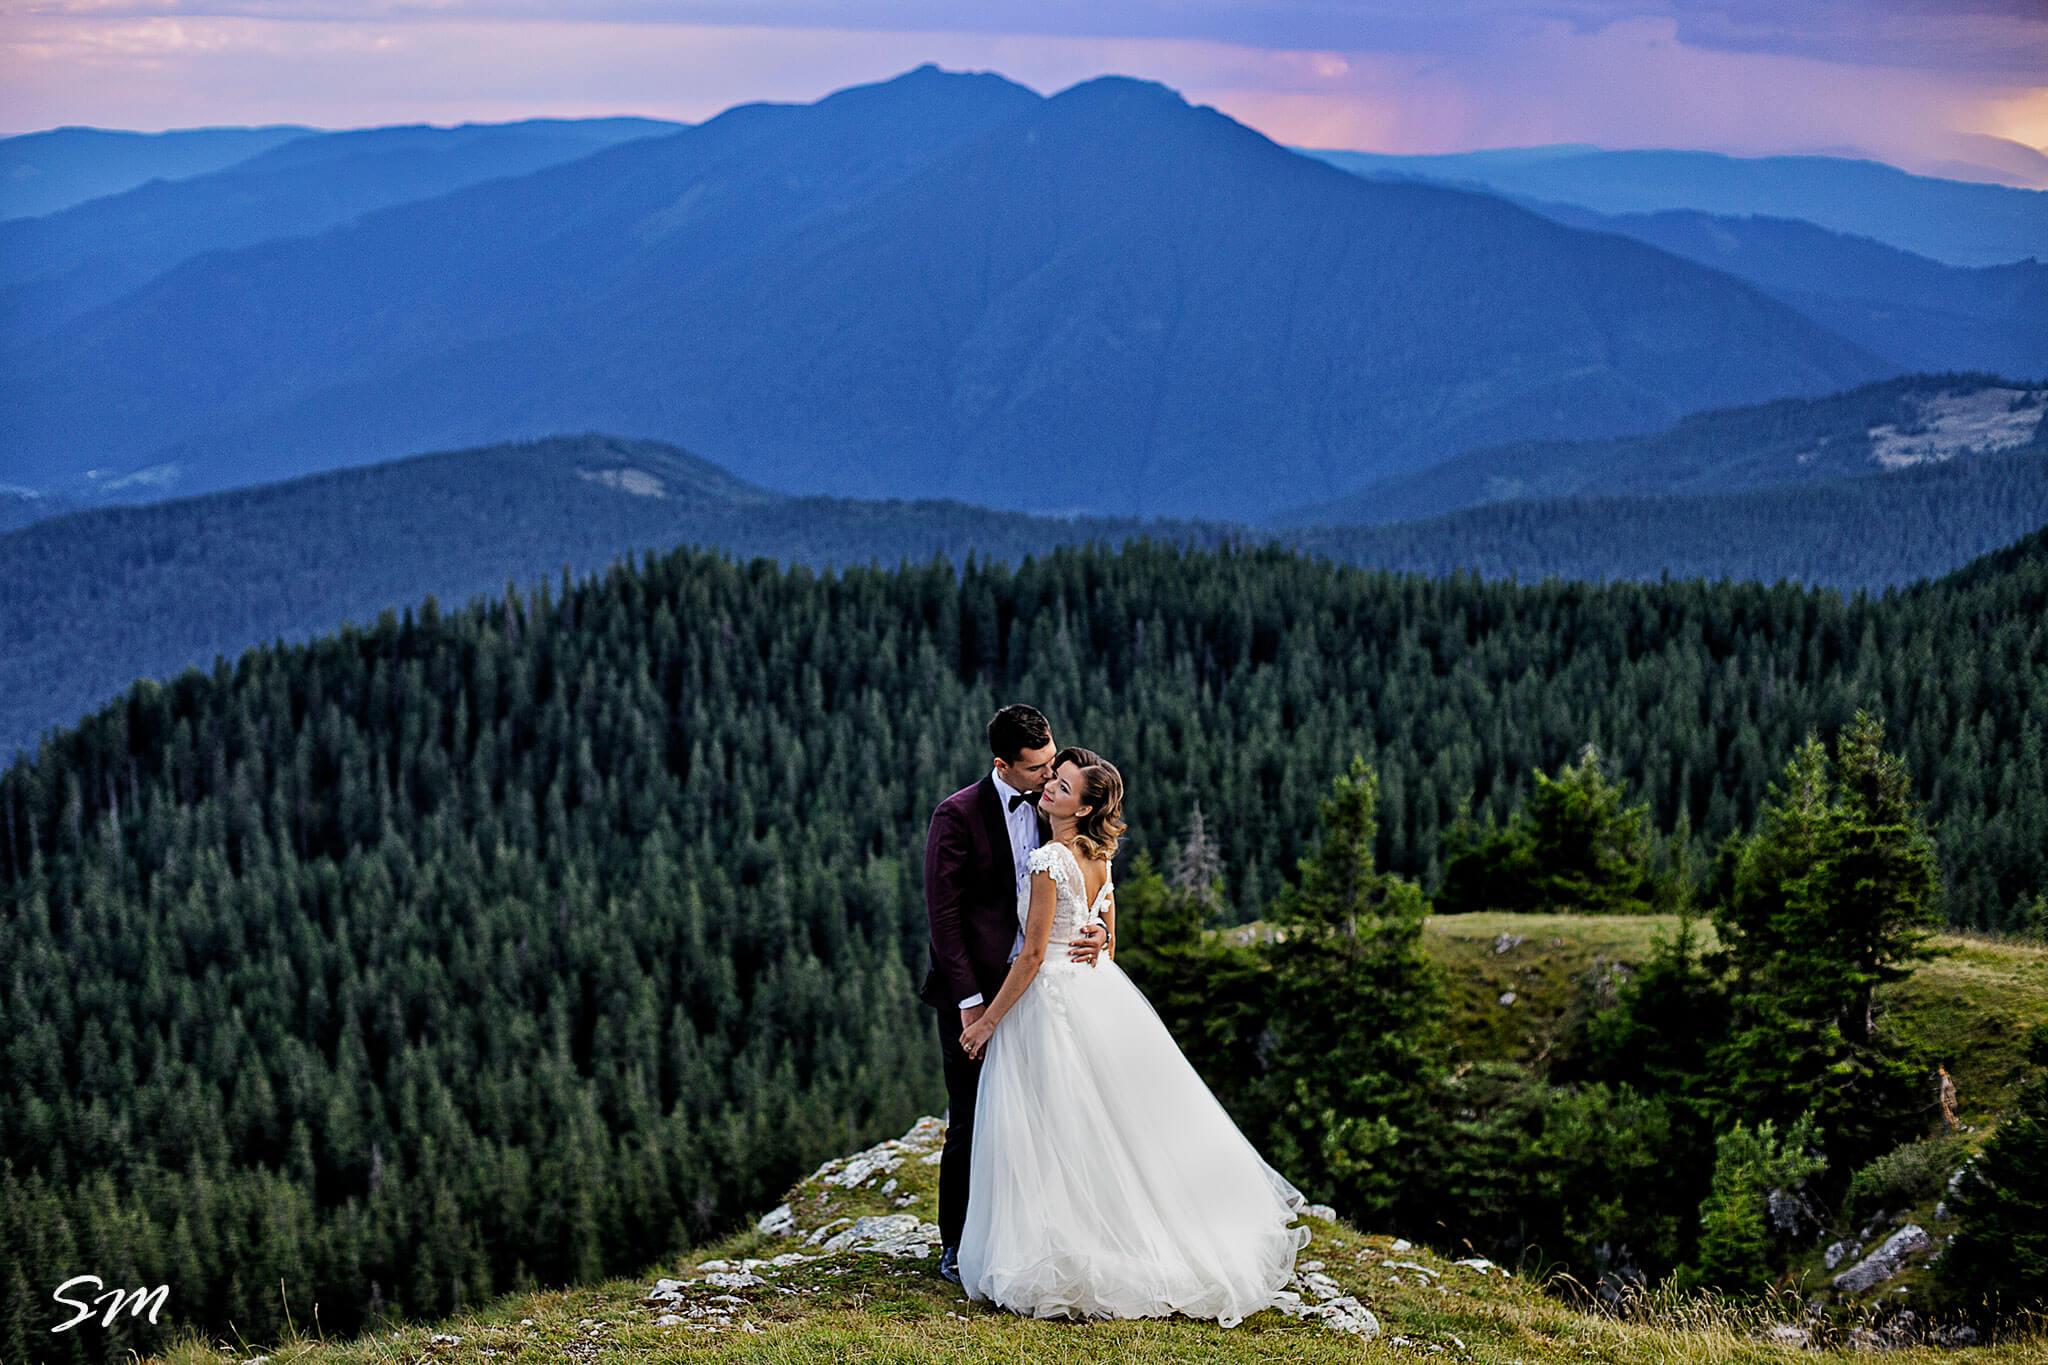 fotograf_nunta_profesionist_suceava-8